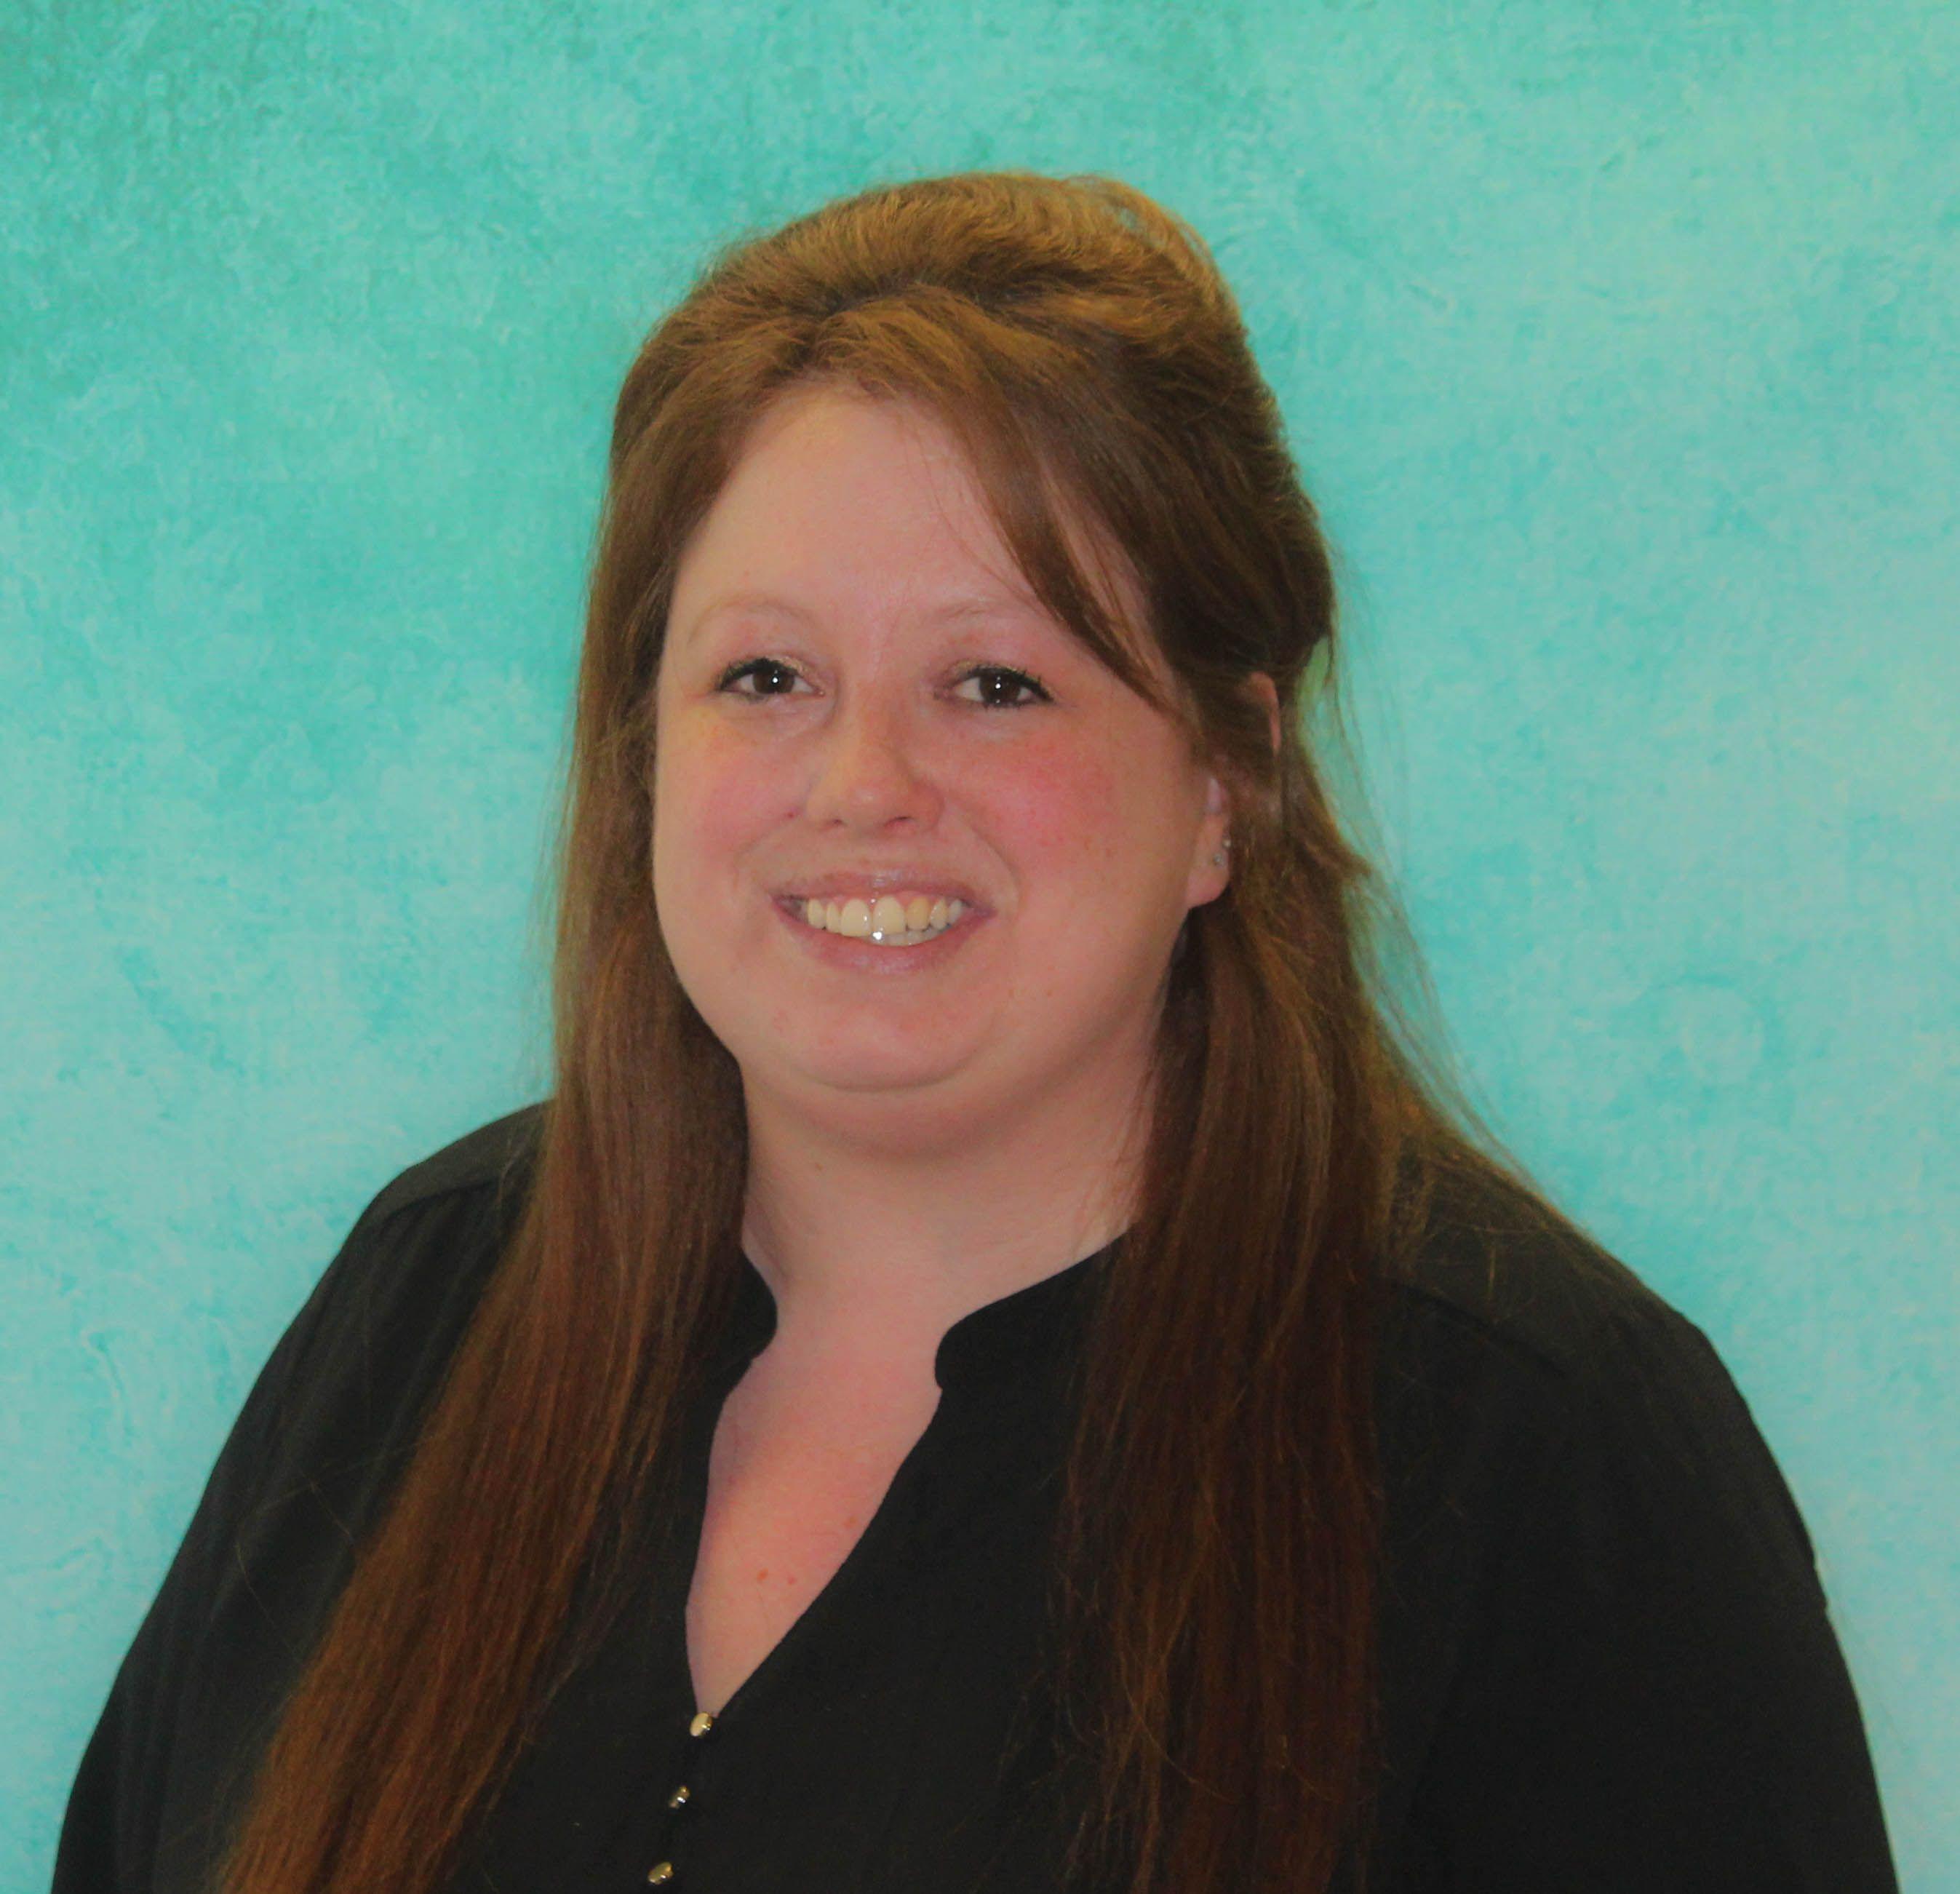 Tara Morast, Account Manager